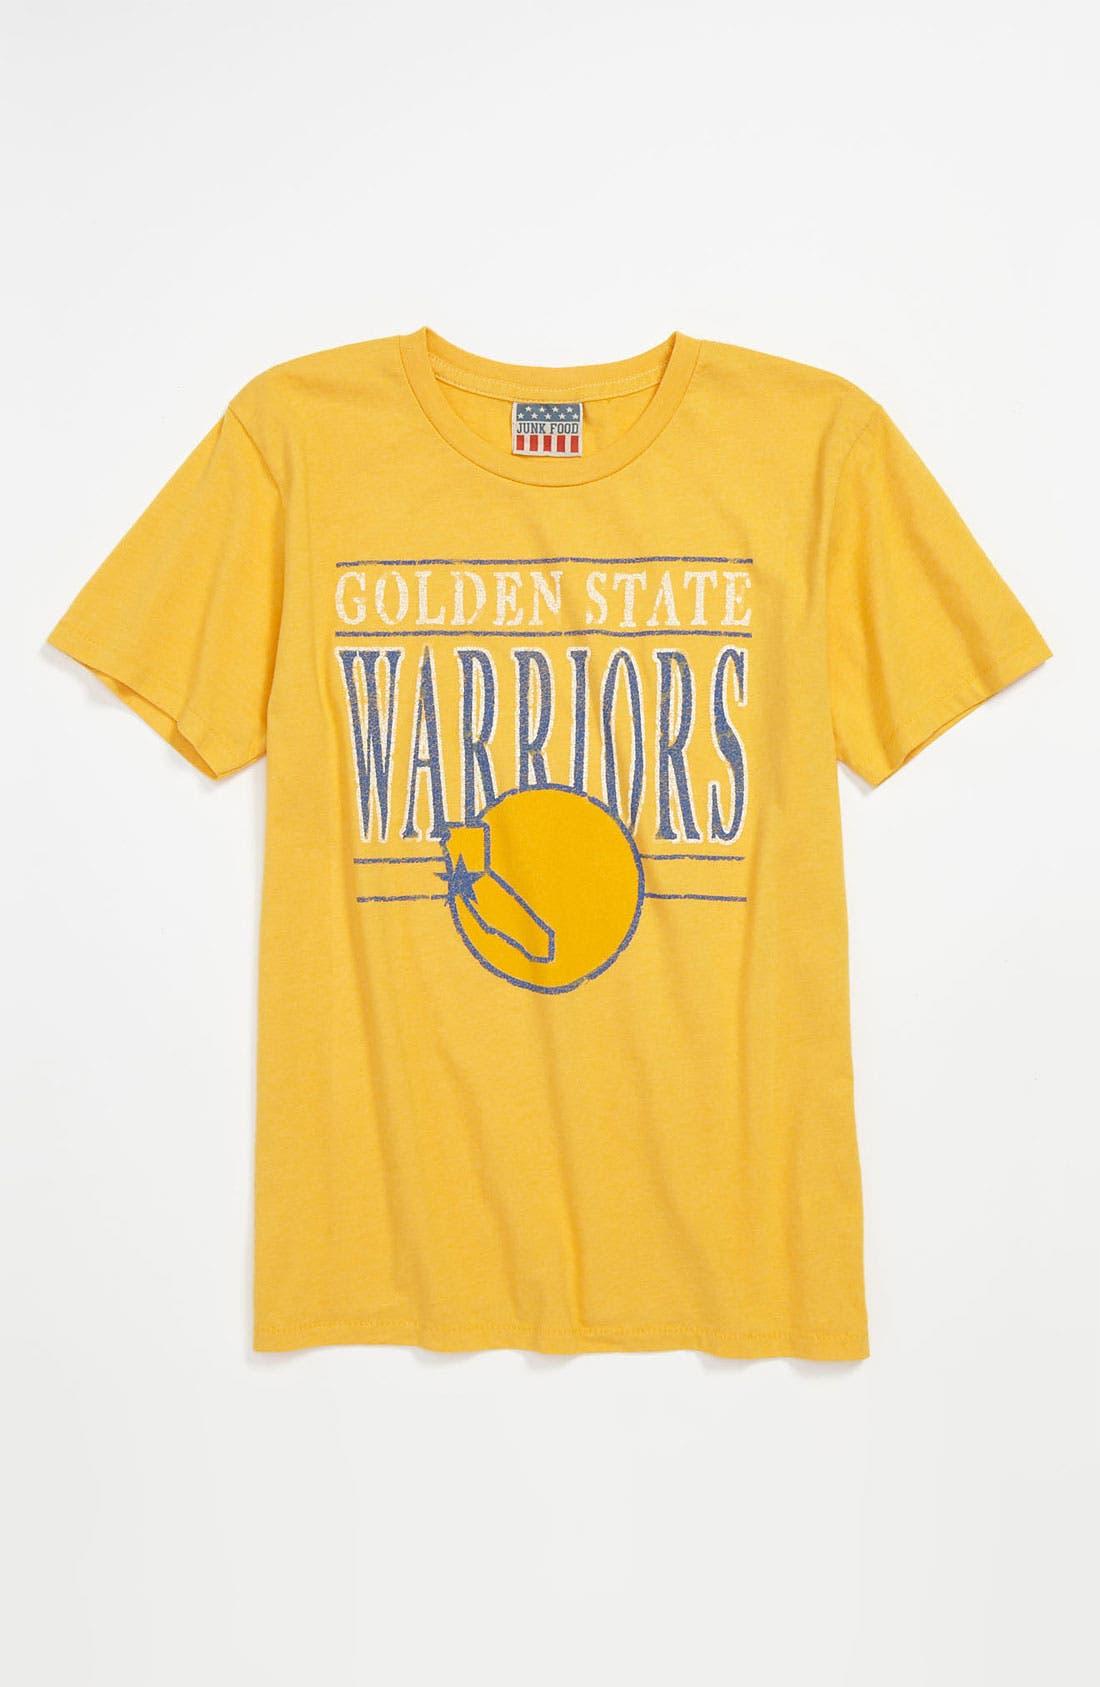 Alternate Image 1 Selected - Junk Food 'Golden State Warriors' T-Shirt (Little Boys & Big Boys)